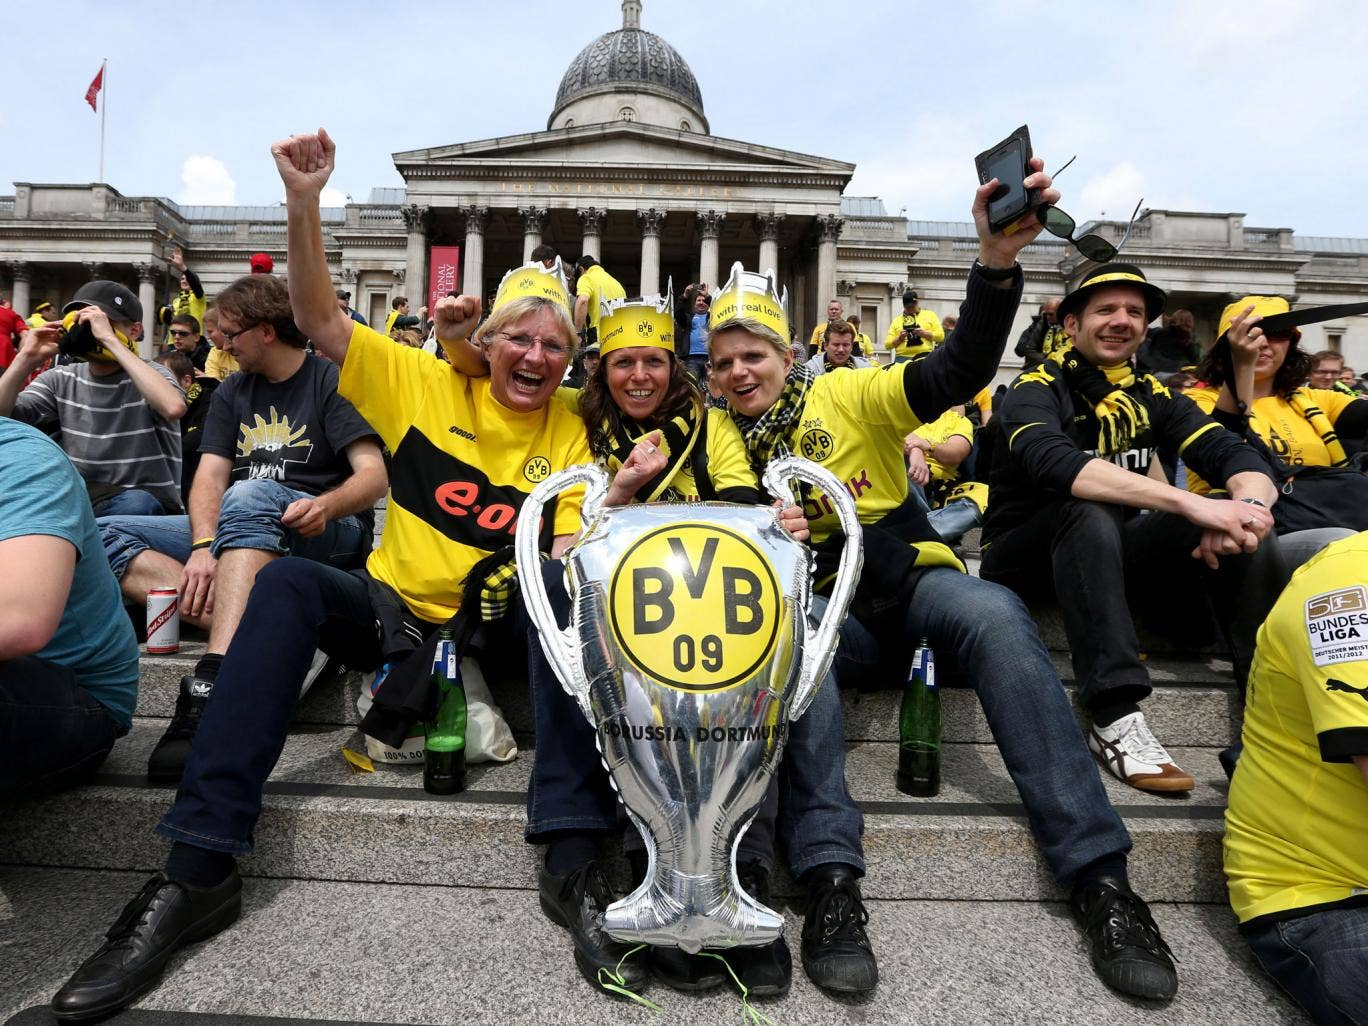 Borussia Dortmund fans in Trafalgar Square